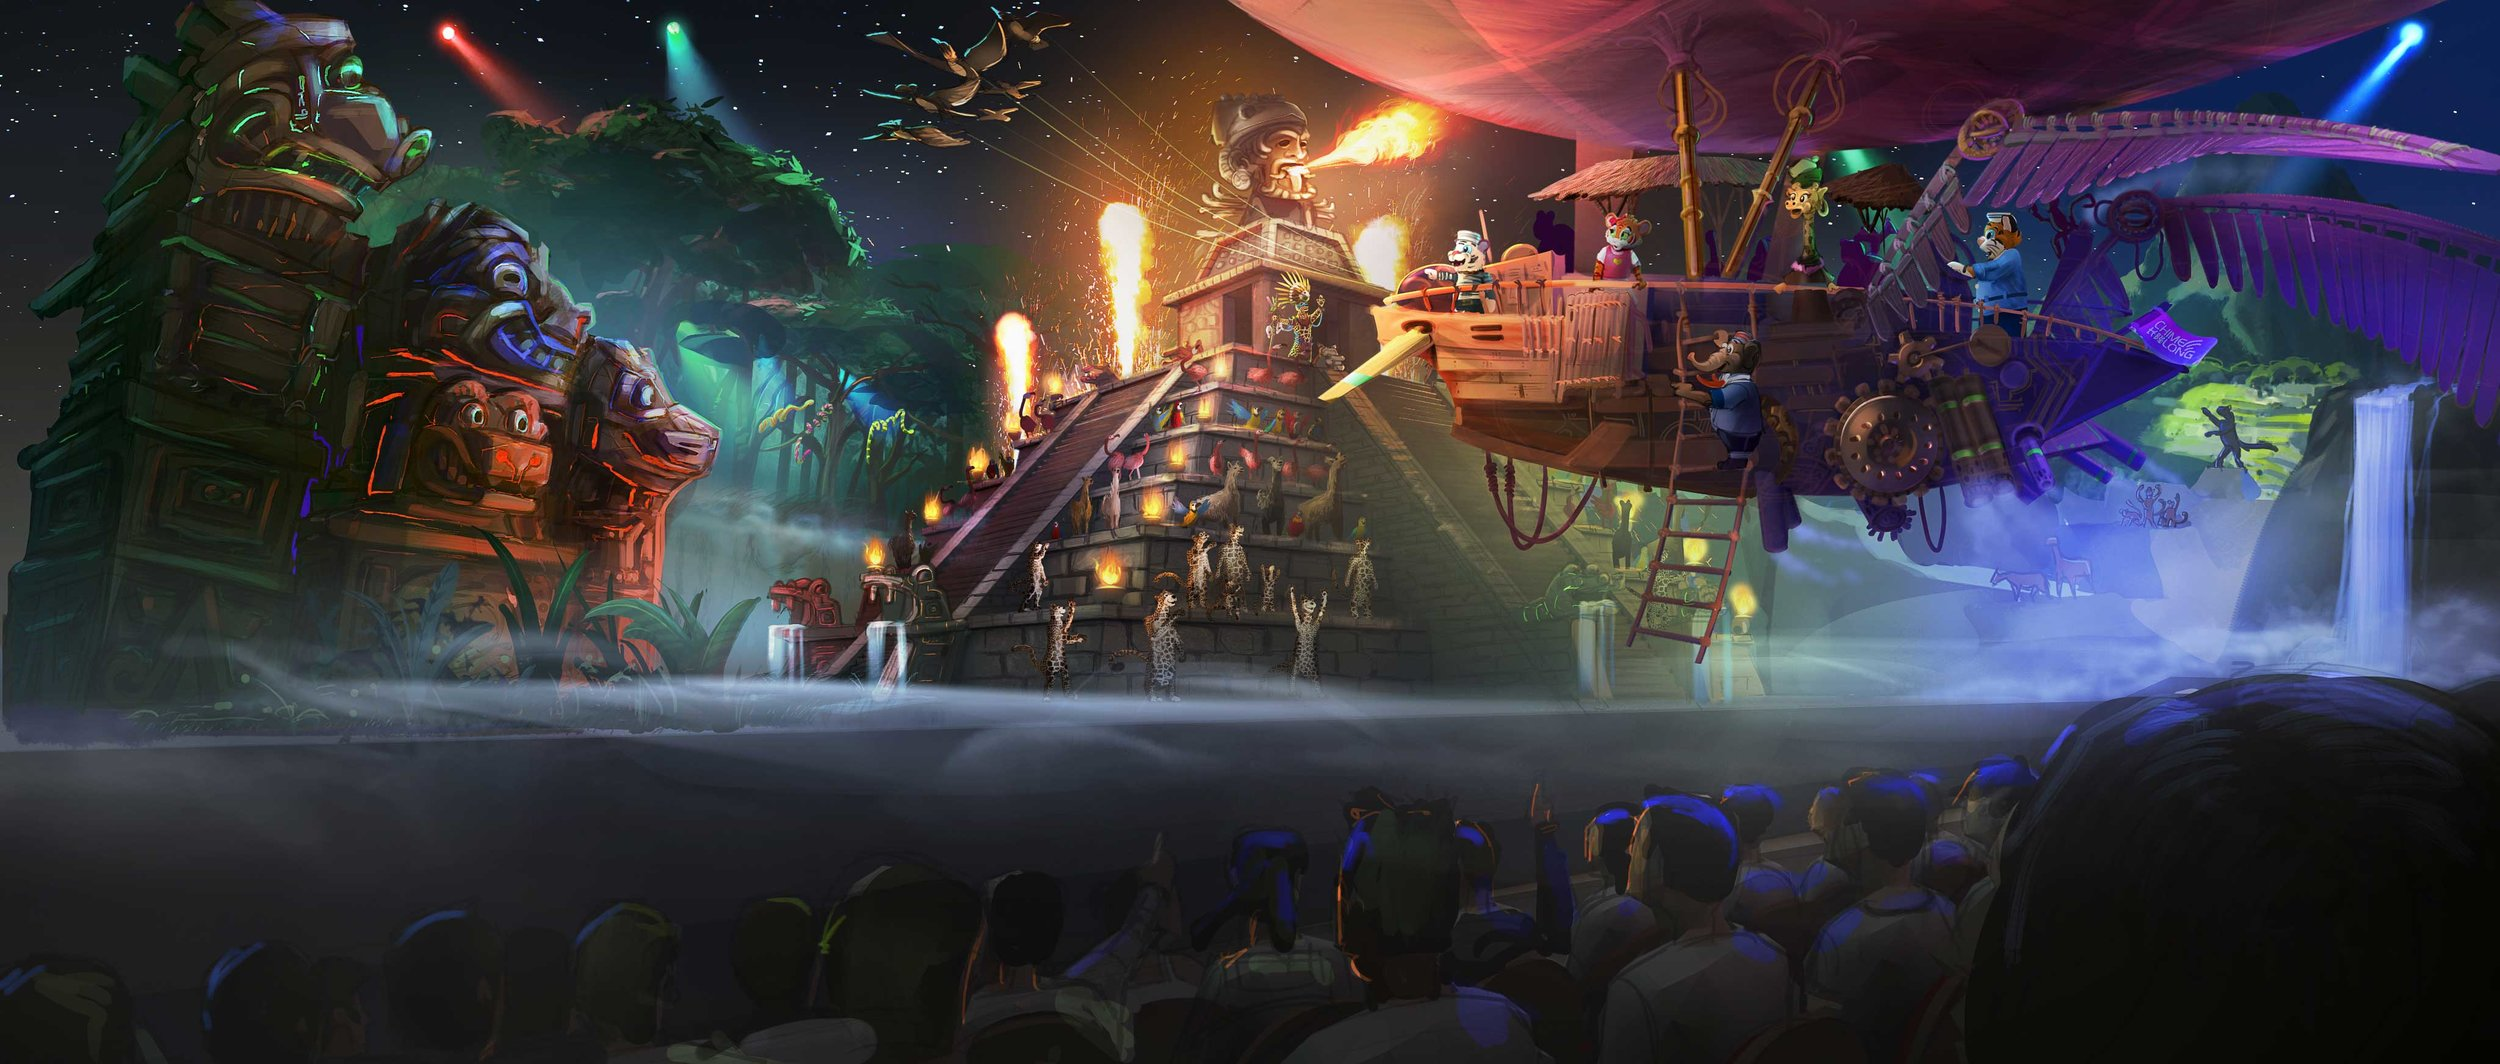 """Mr. Su's Tigers,"" Animatronics Show, Chimelong Theme Parks"